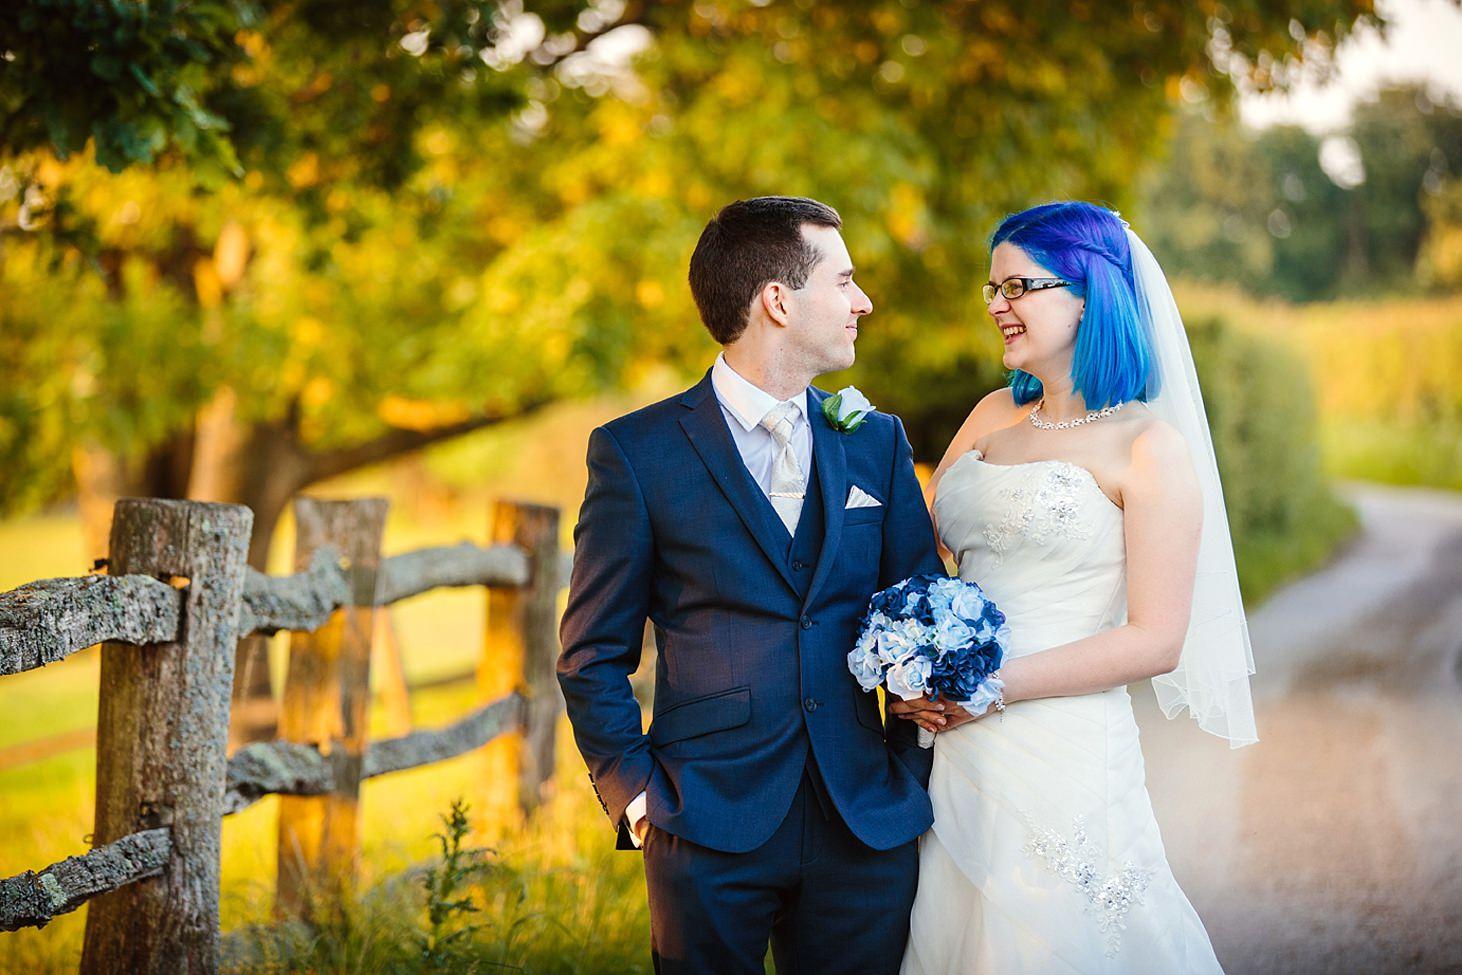 gate street barn wedding photography bride and groom smiling